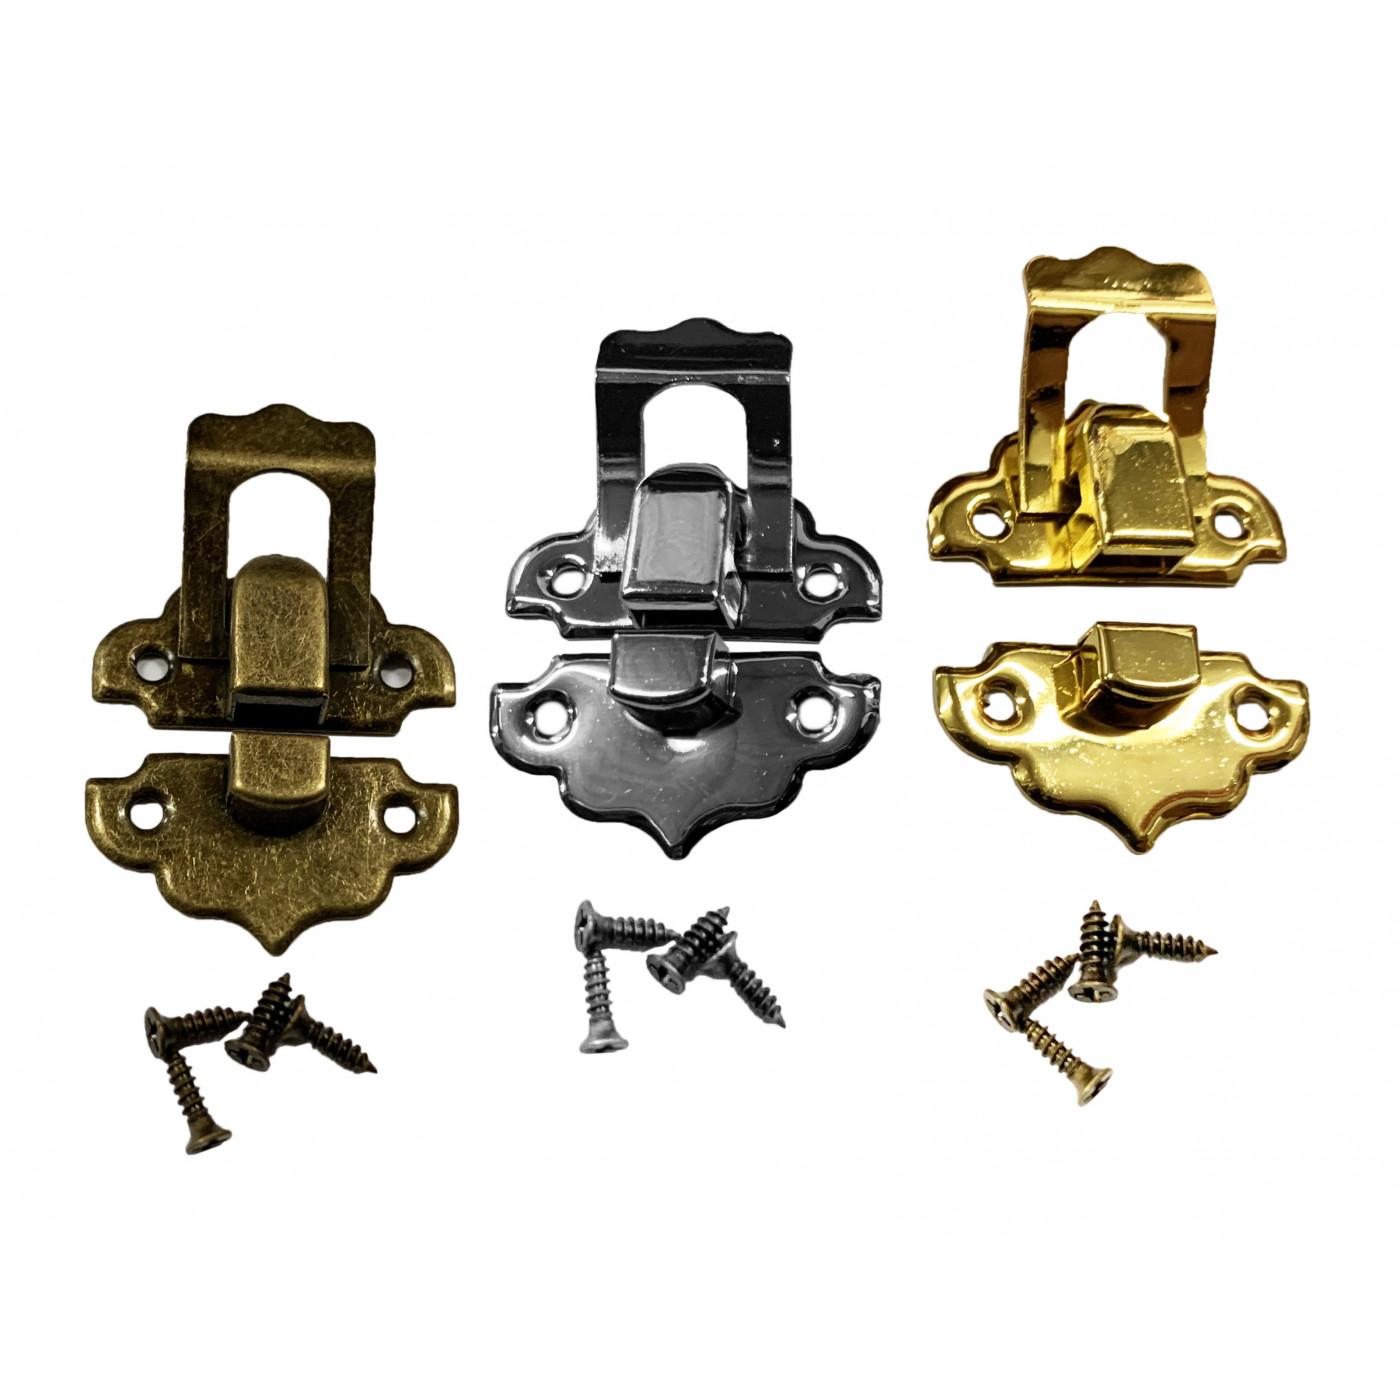 Set of 30 small metal retro box locks (color: nickel)